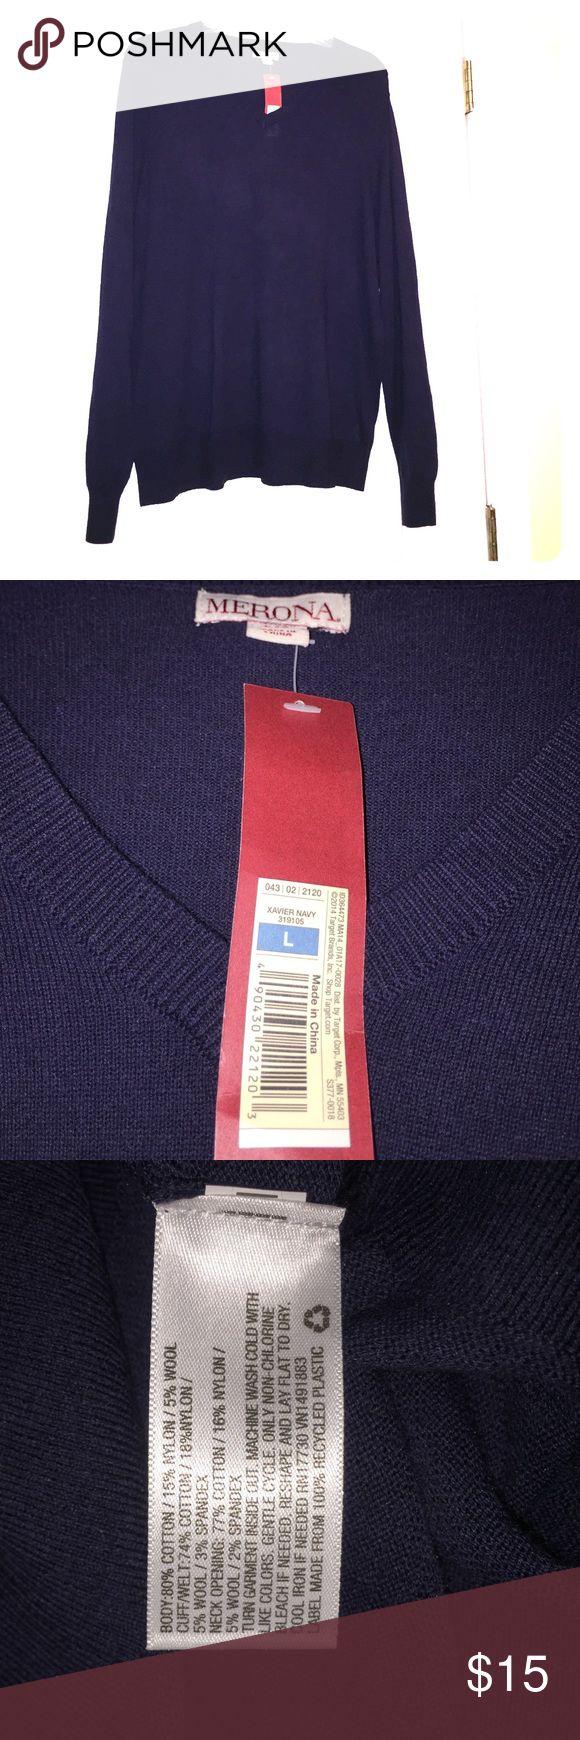 MERONA-- NEW Men's V-neck sweater MERONA-- NEW Men's V-neck sweater. Navy blue. Merona Sweaters V-Neck